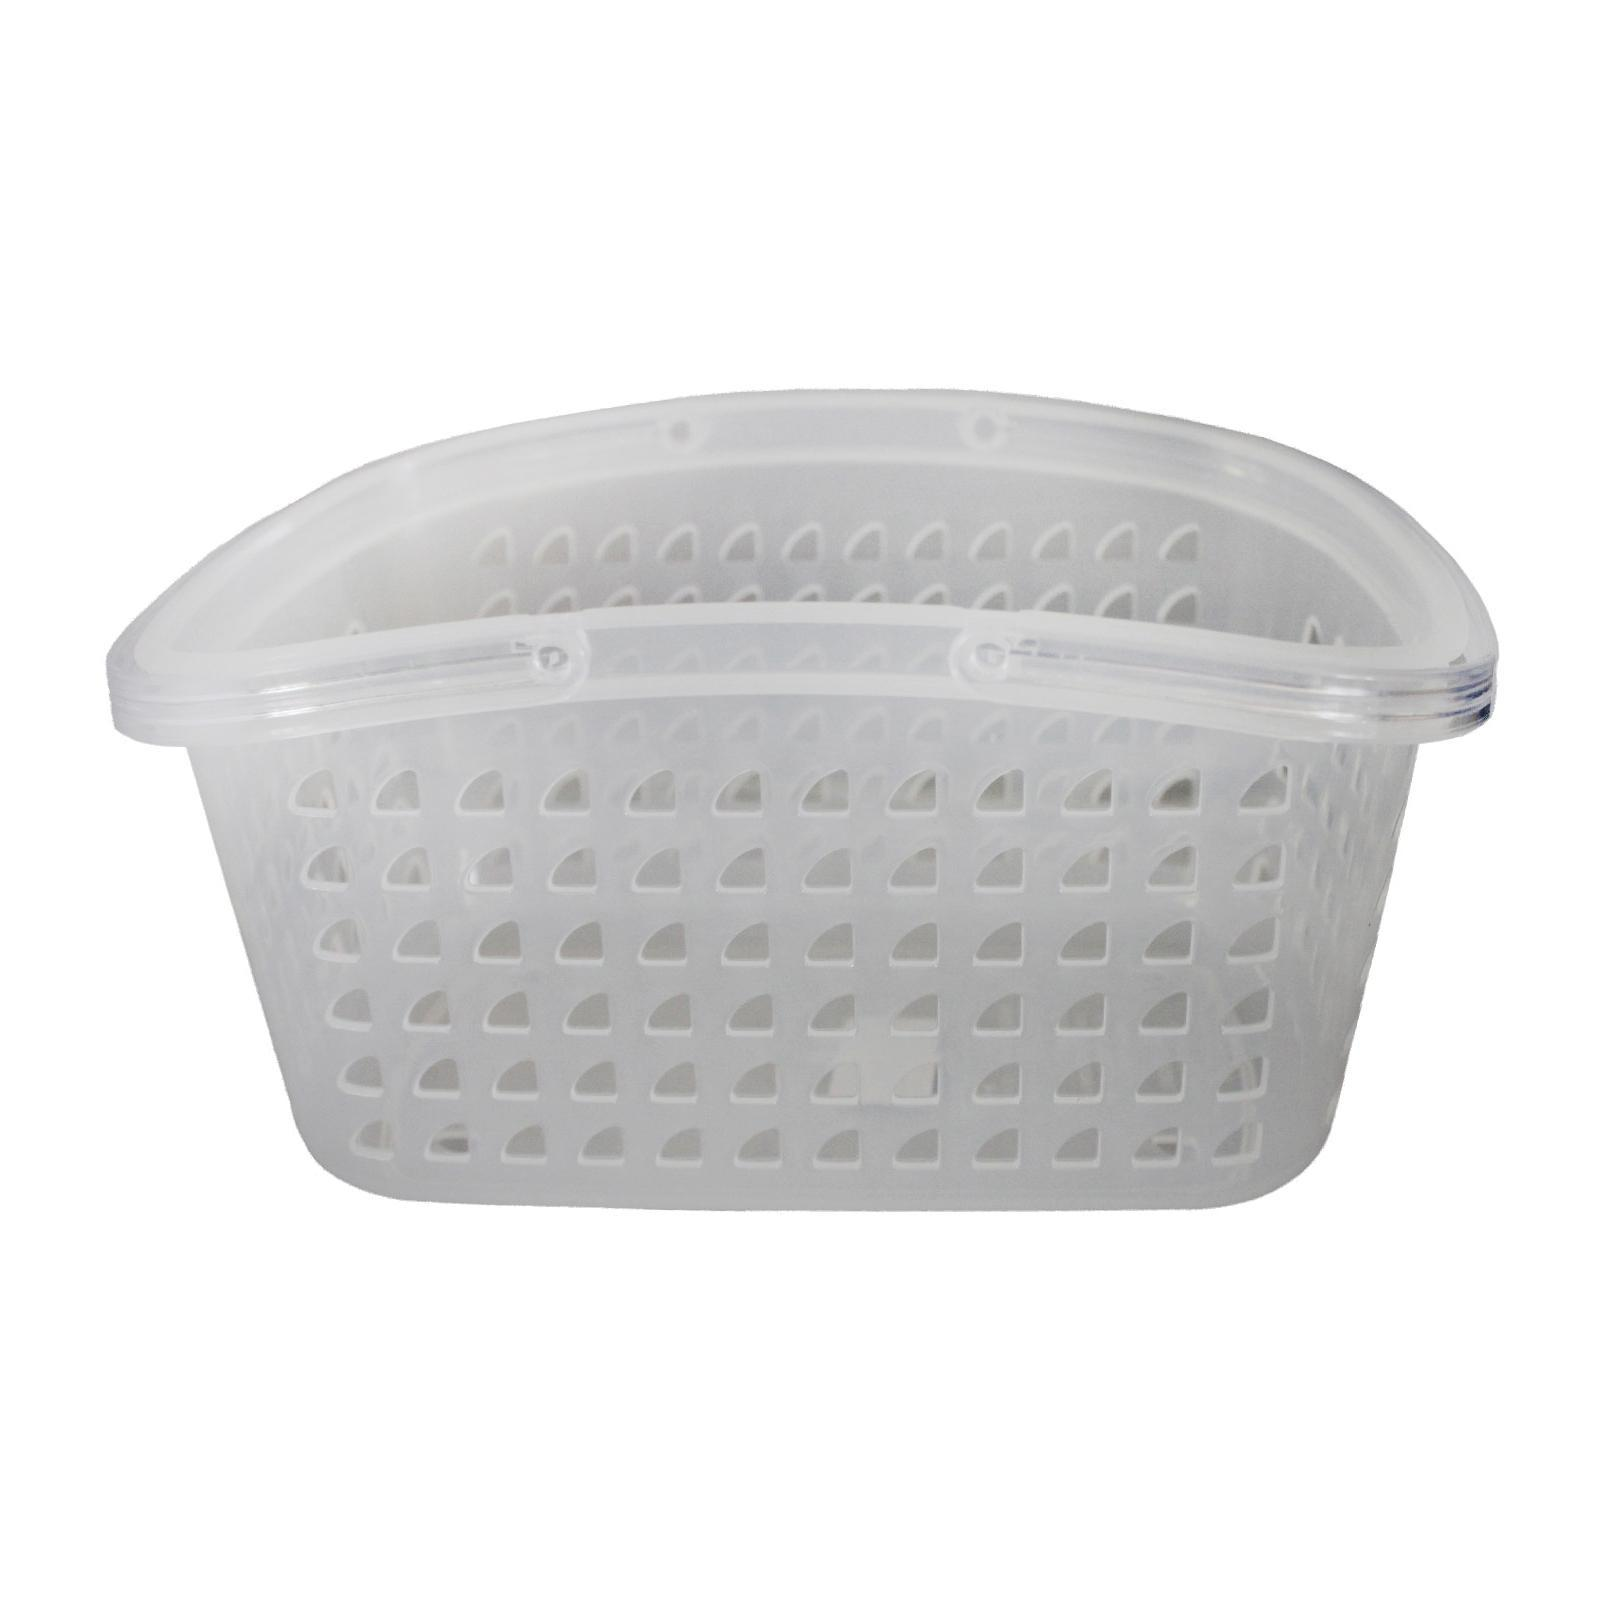 Sanada Seiko Plastic Storage Basket With Handles 002